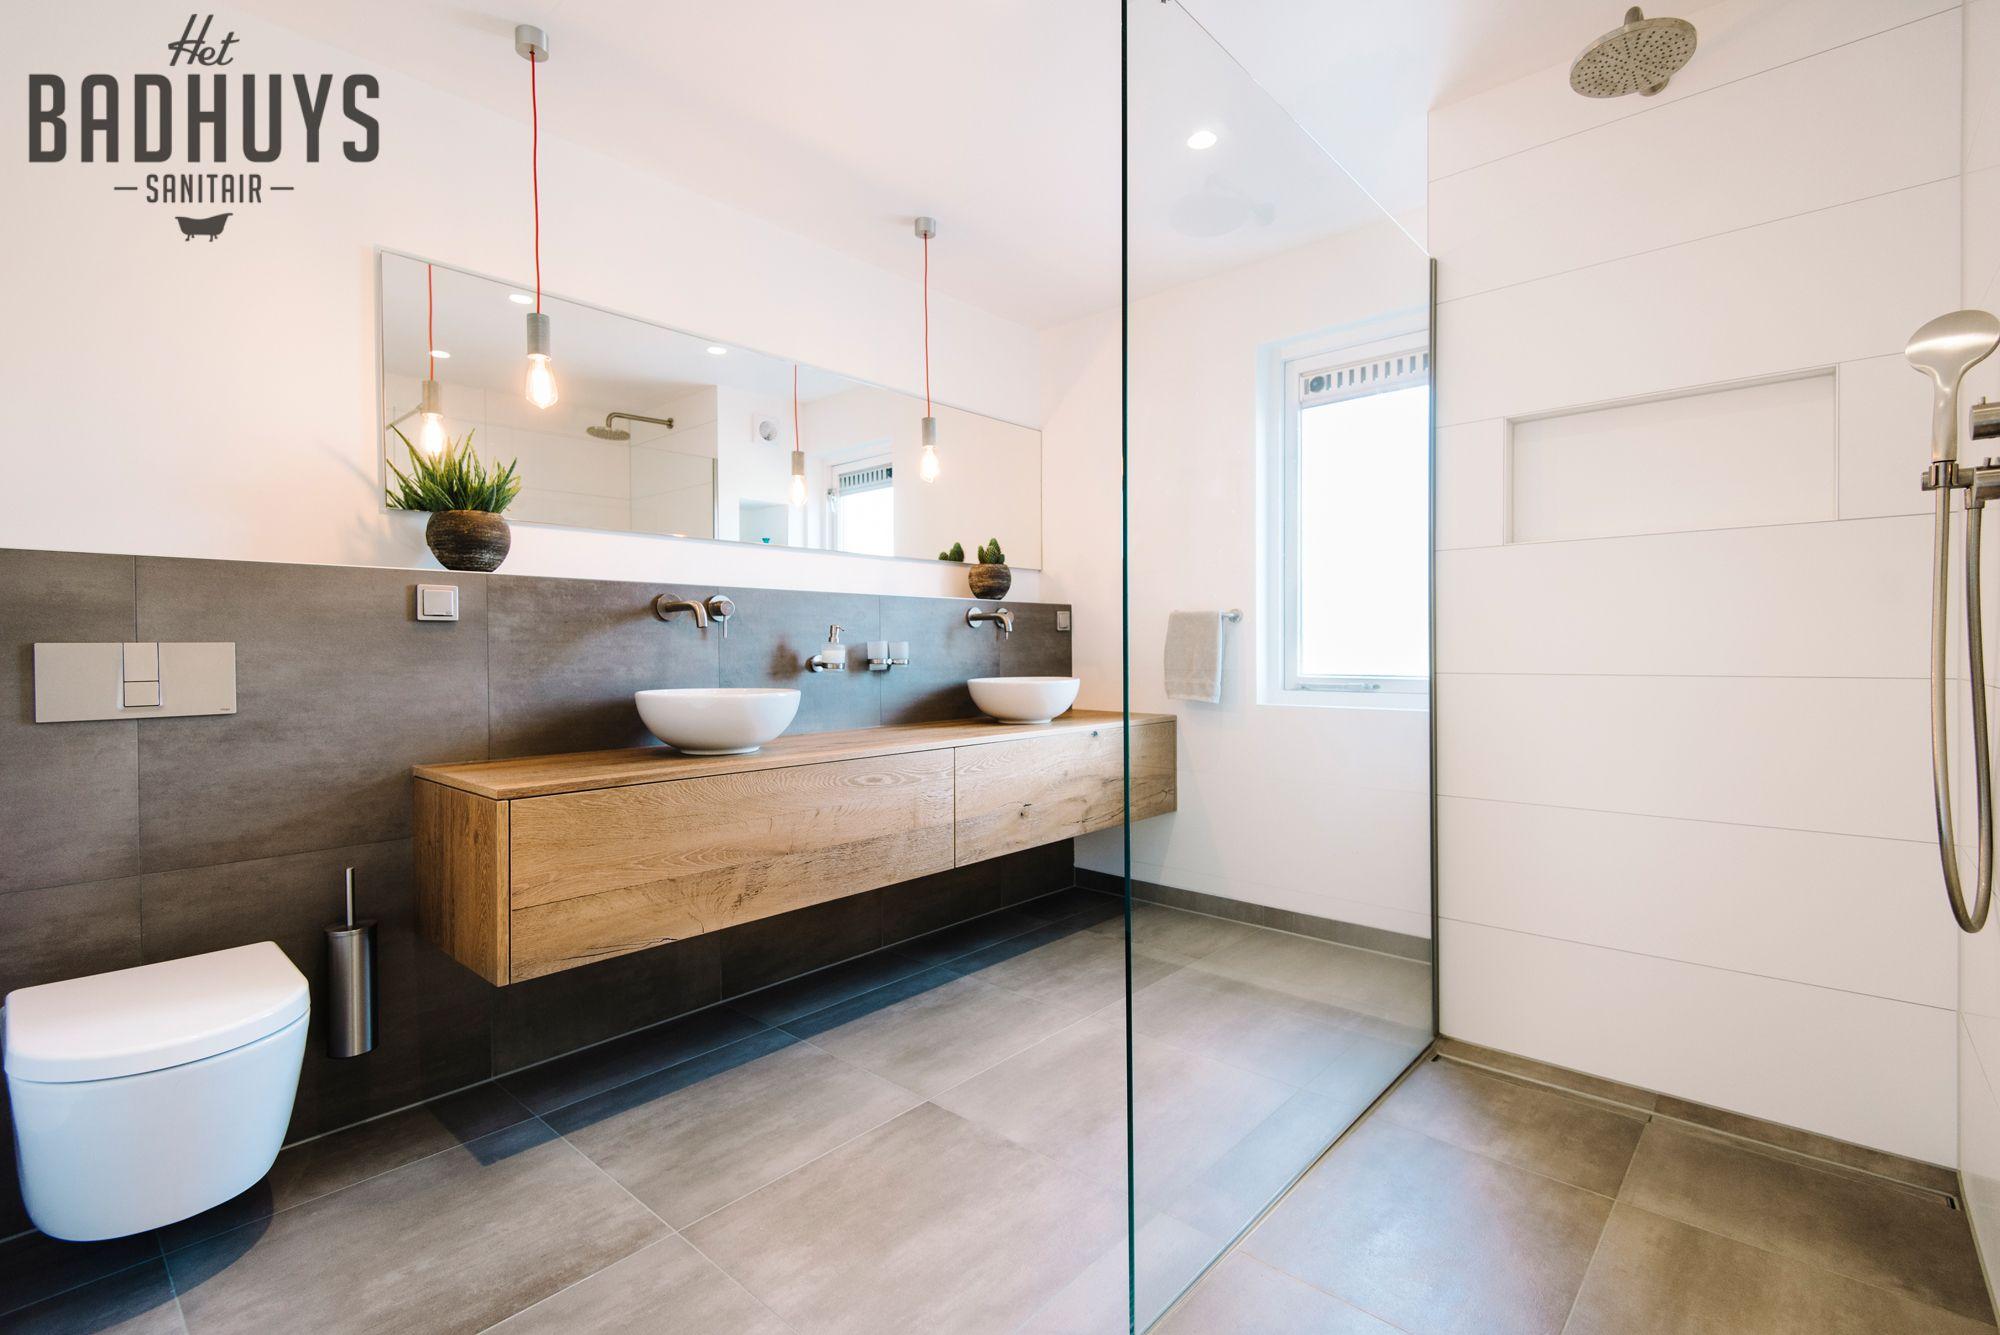 Badkamer met inloopdouche en inbouwkast | Het Badhuys | Badkamer ...